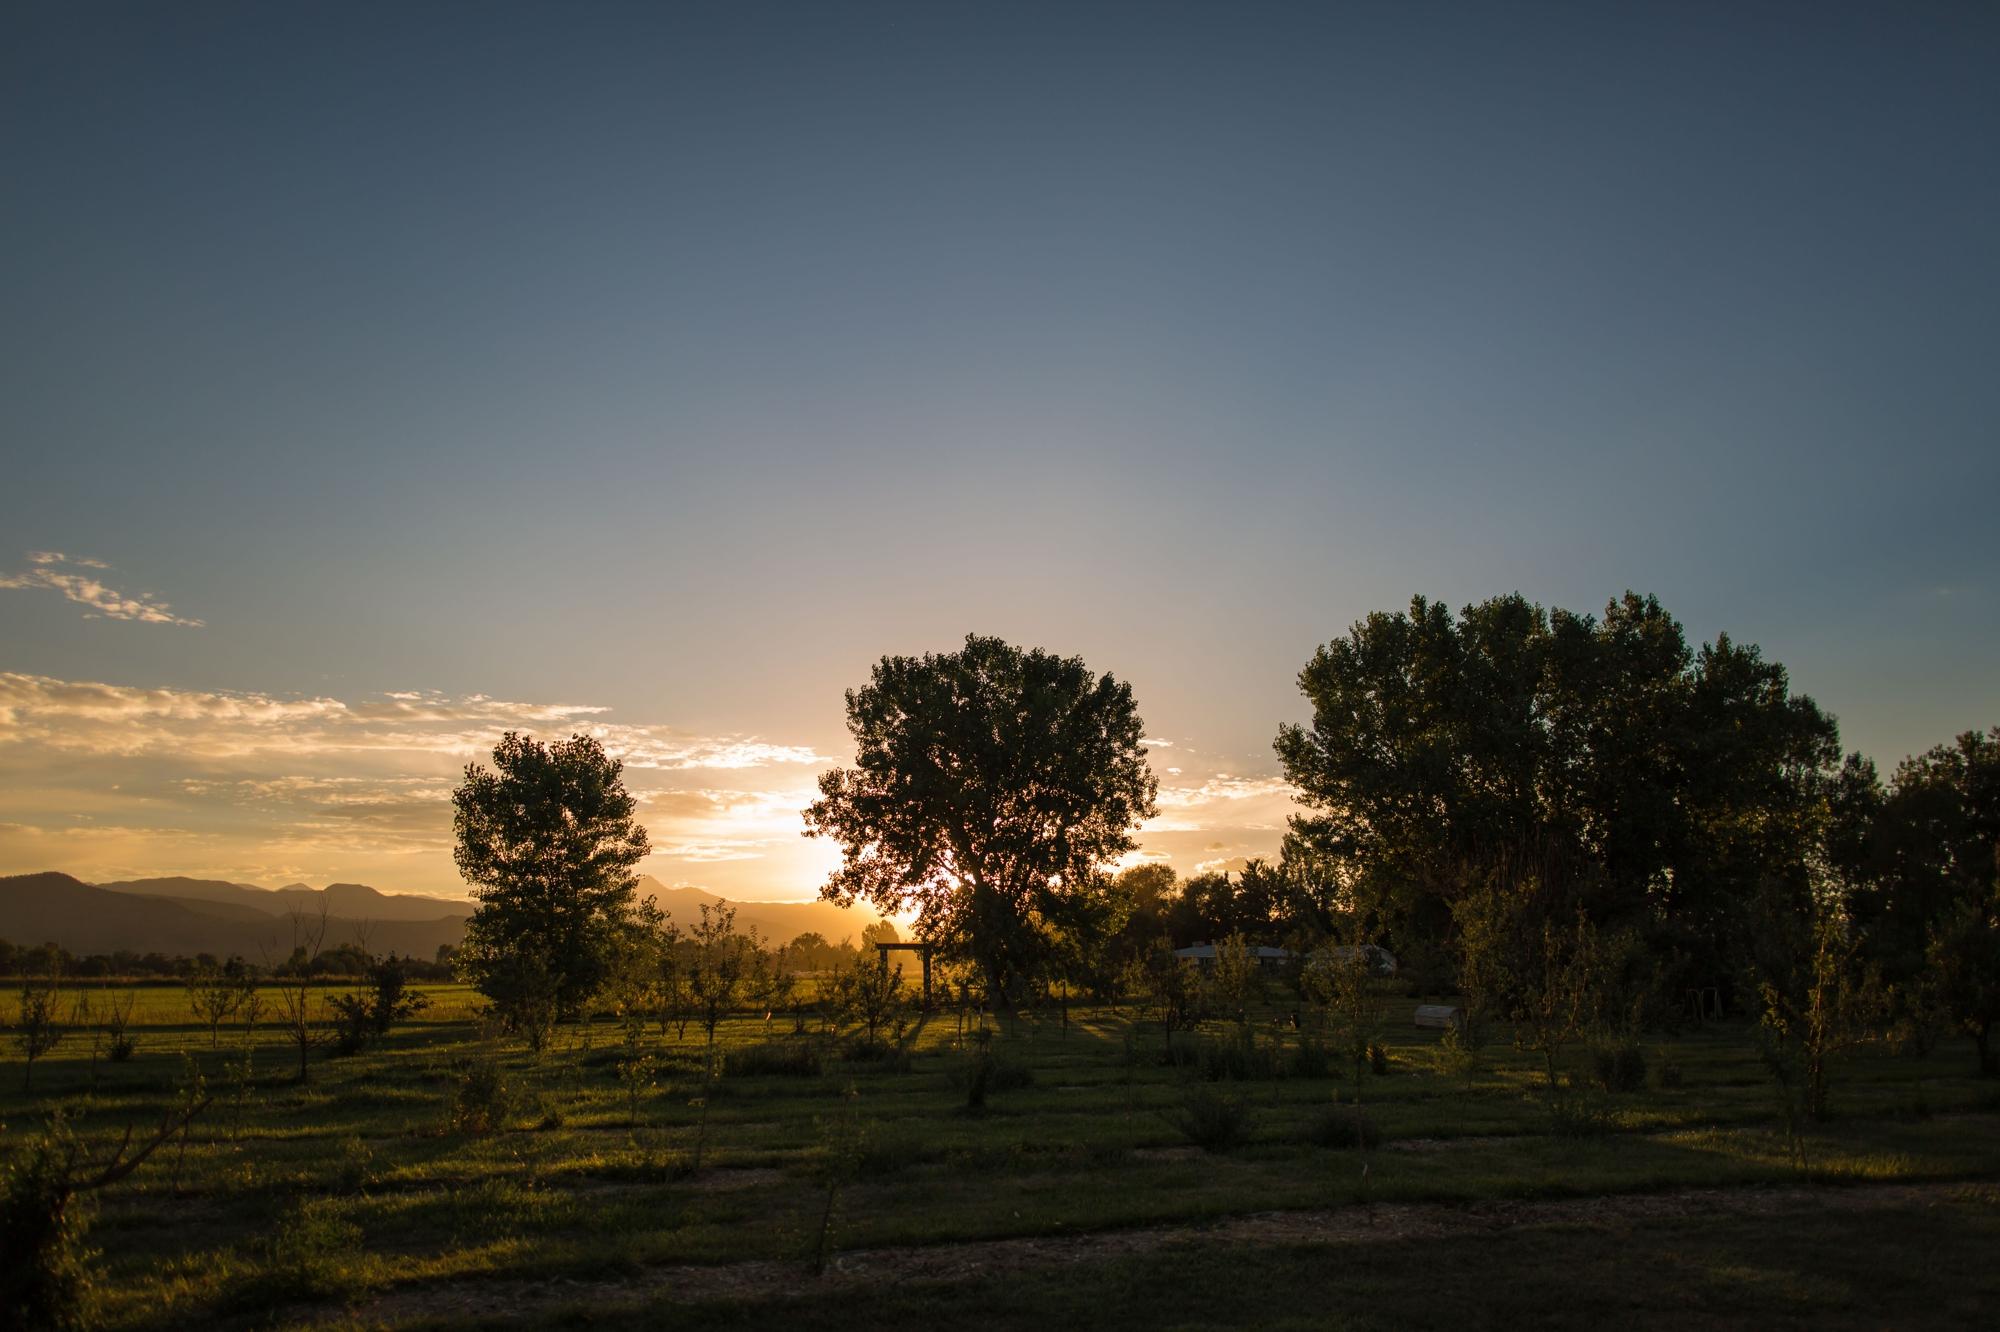 Gorgeous Ya Ya Farm & Orchard sunset!